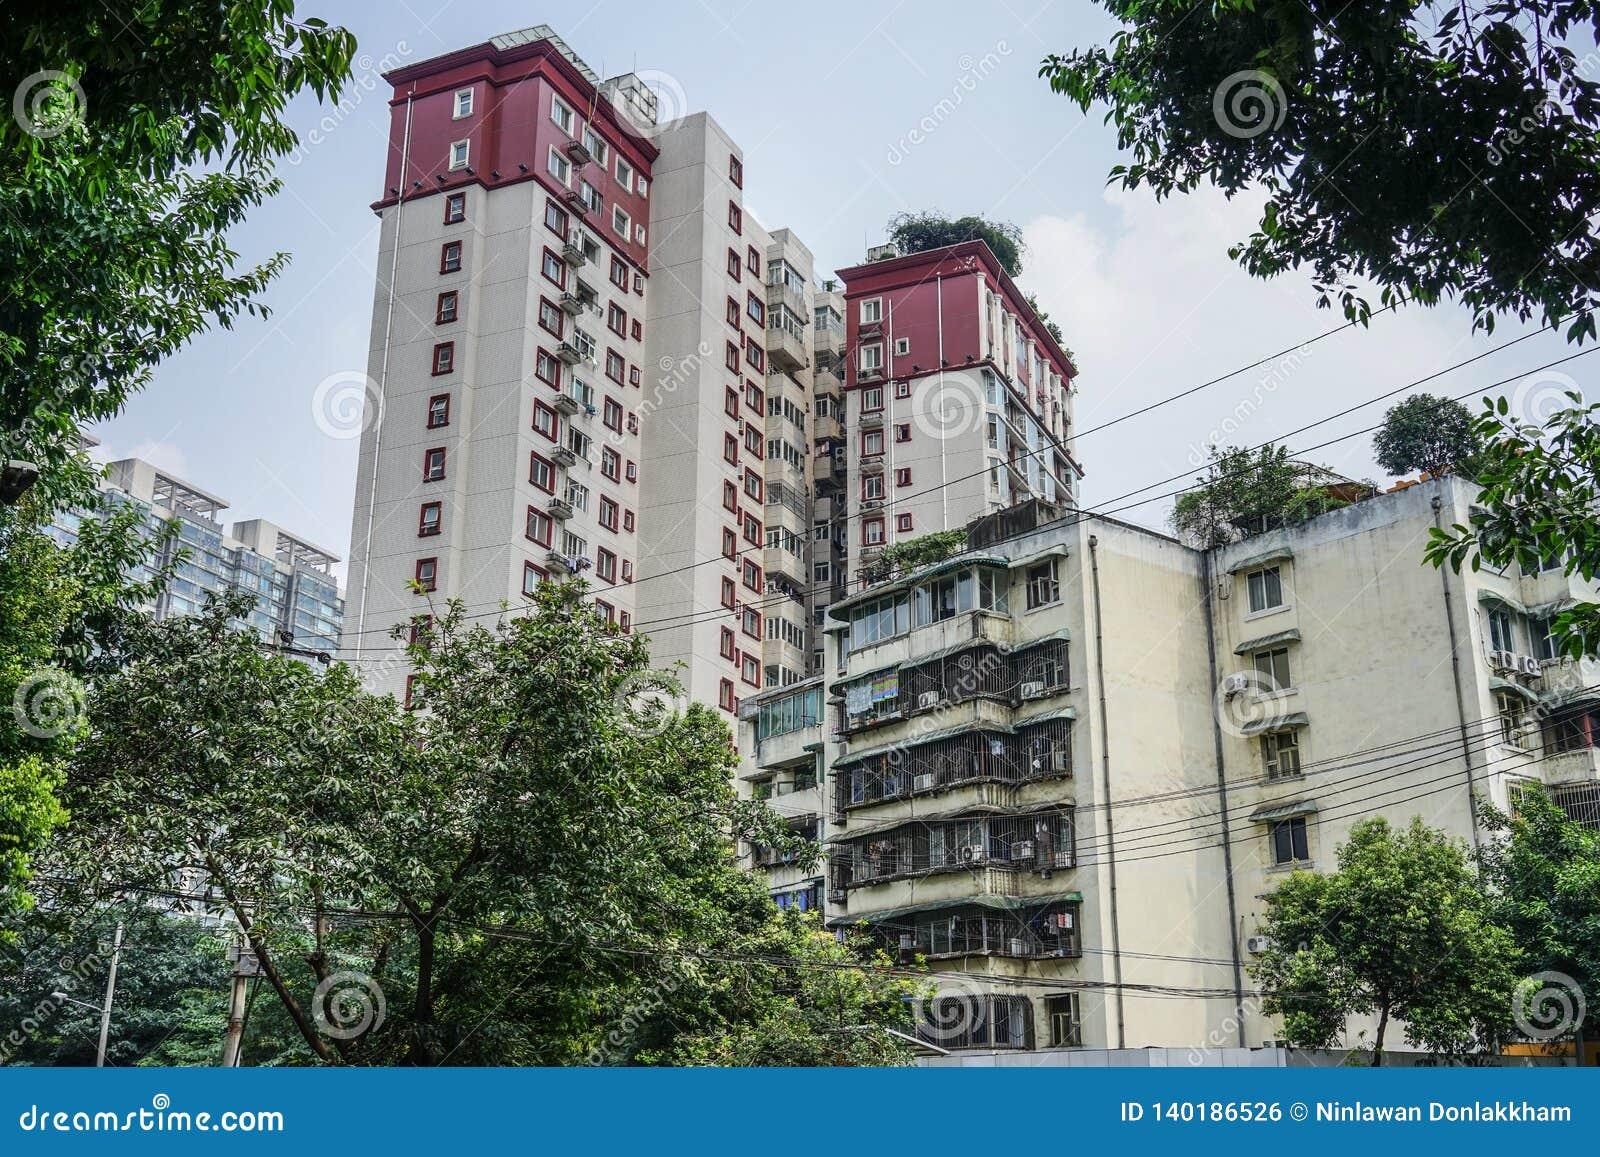 Paesaggio urbano di Chengdu, Cina